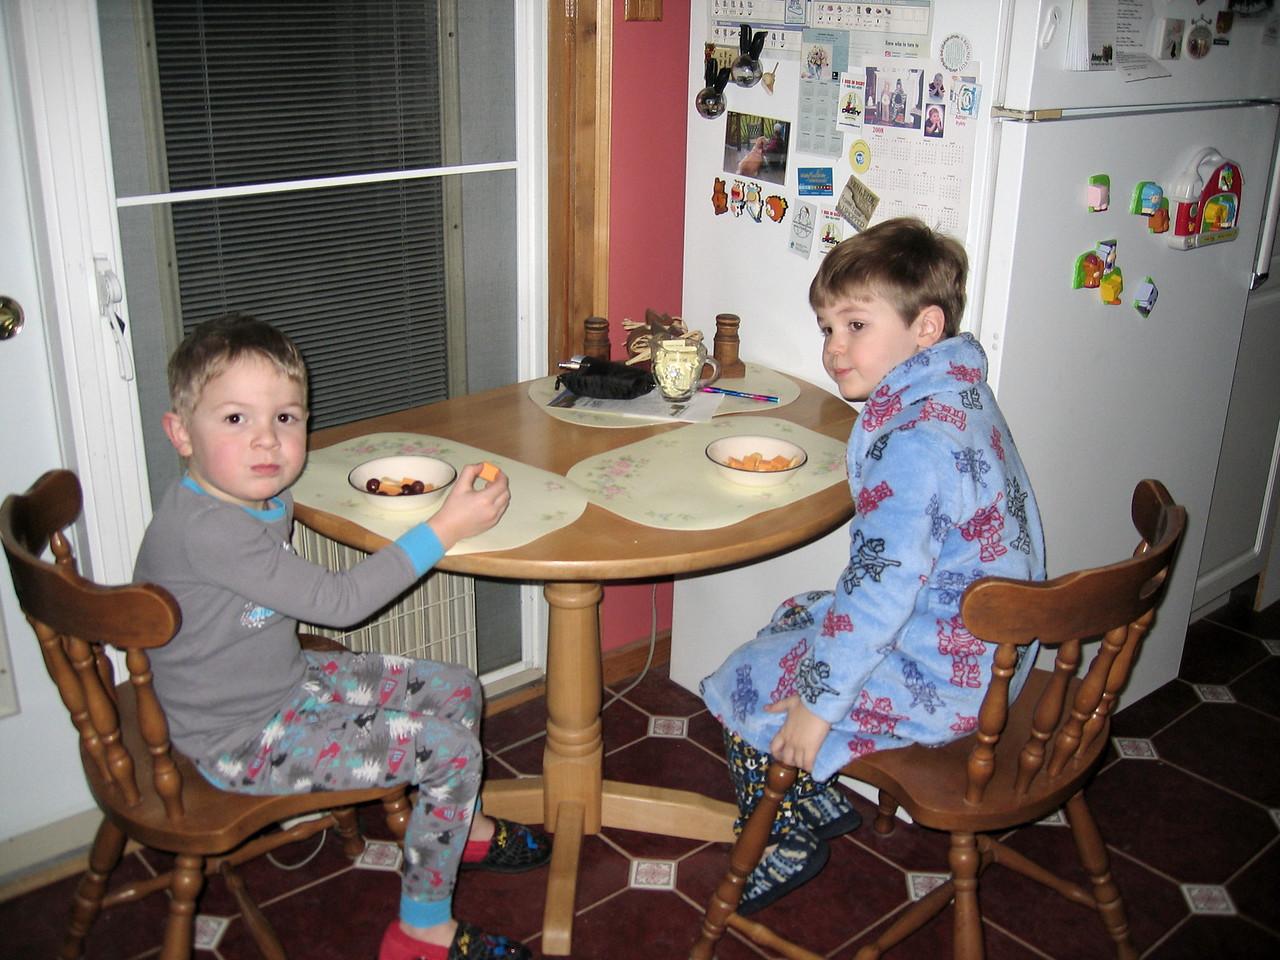 BEDTIME SNACKS.... FRUITS & CHEEZE